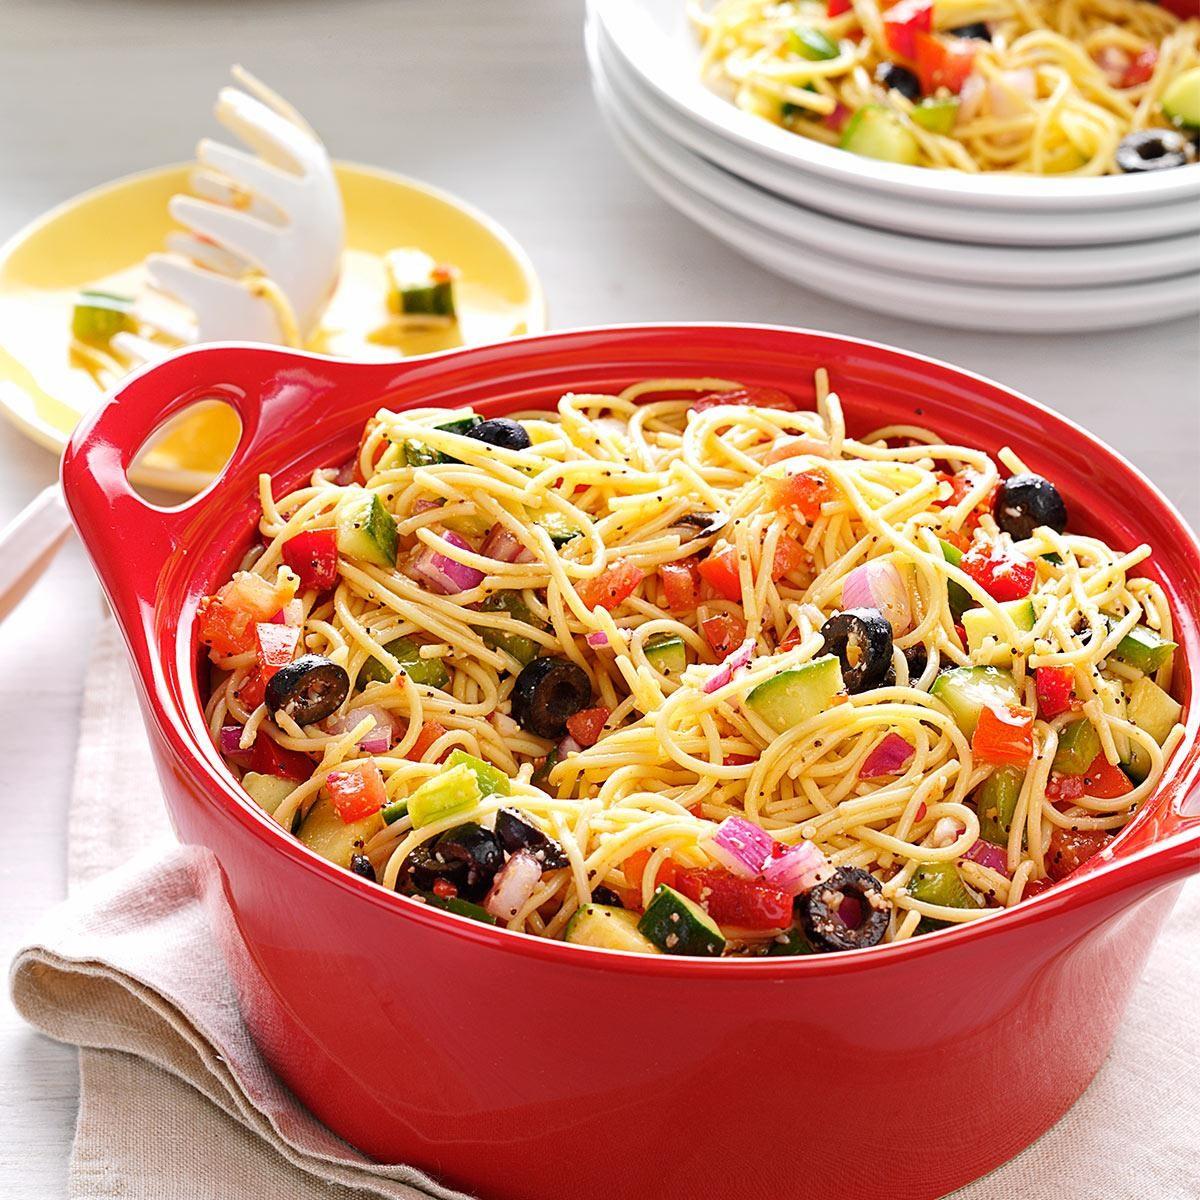 California pasta salad recipe taste of home for Cold pasta salad ideas